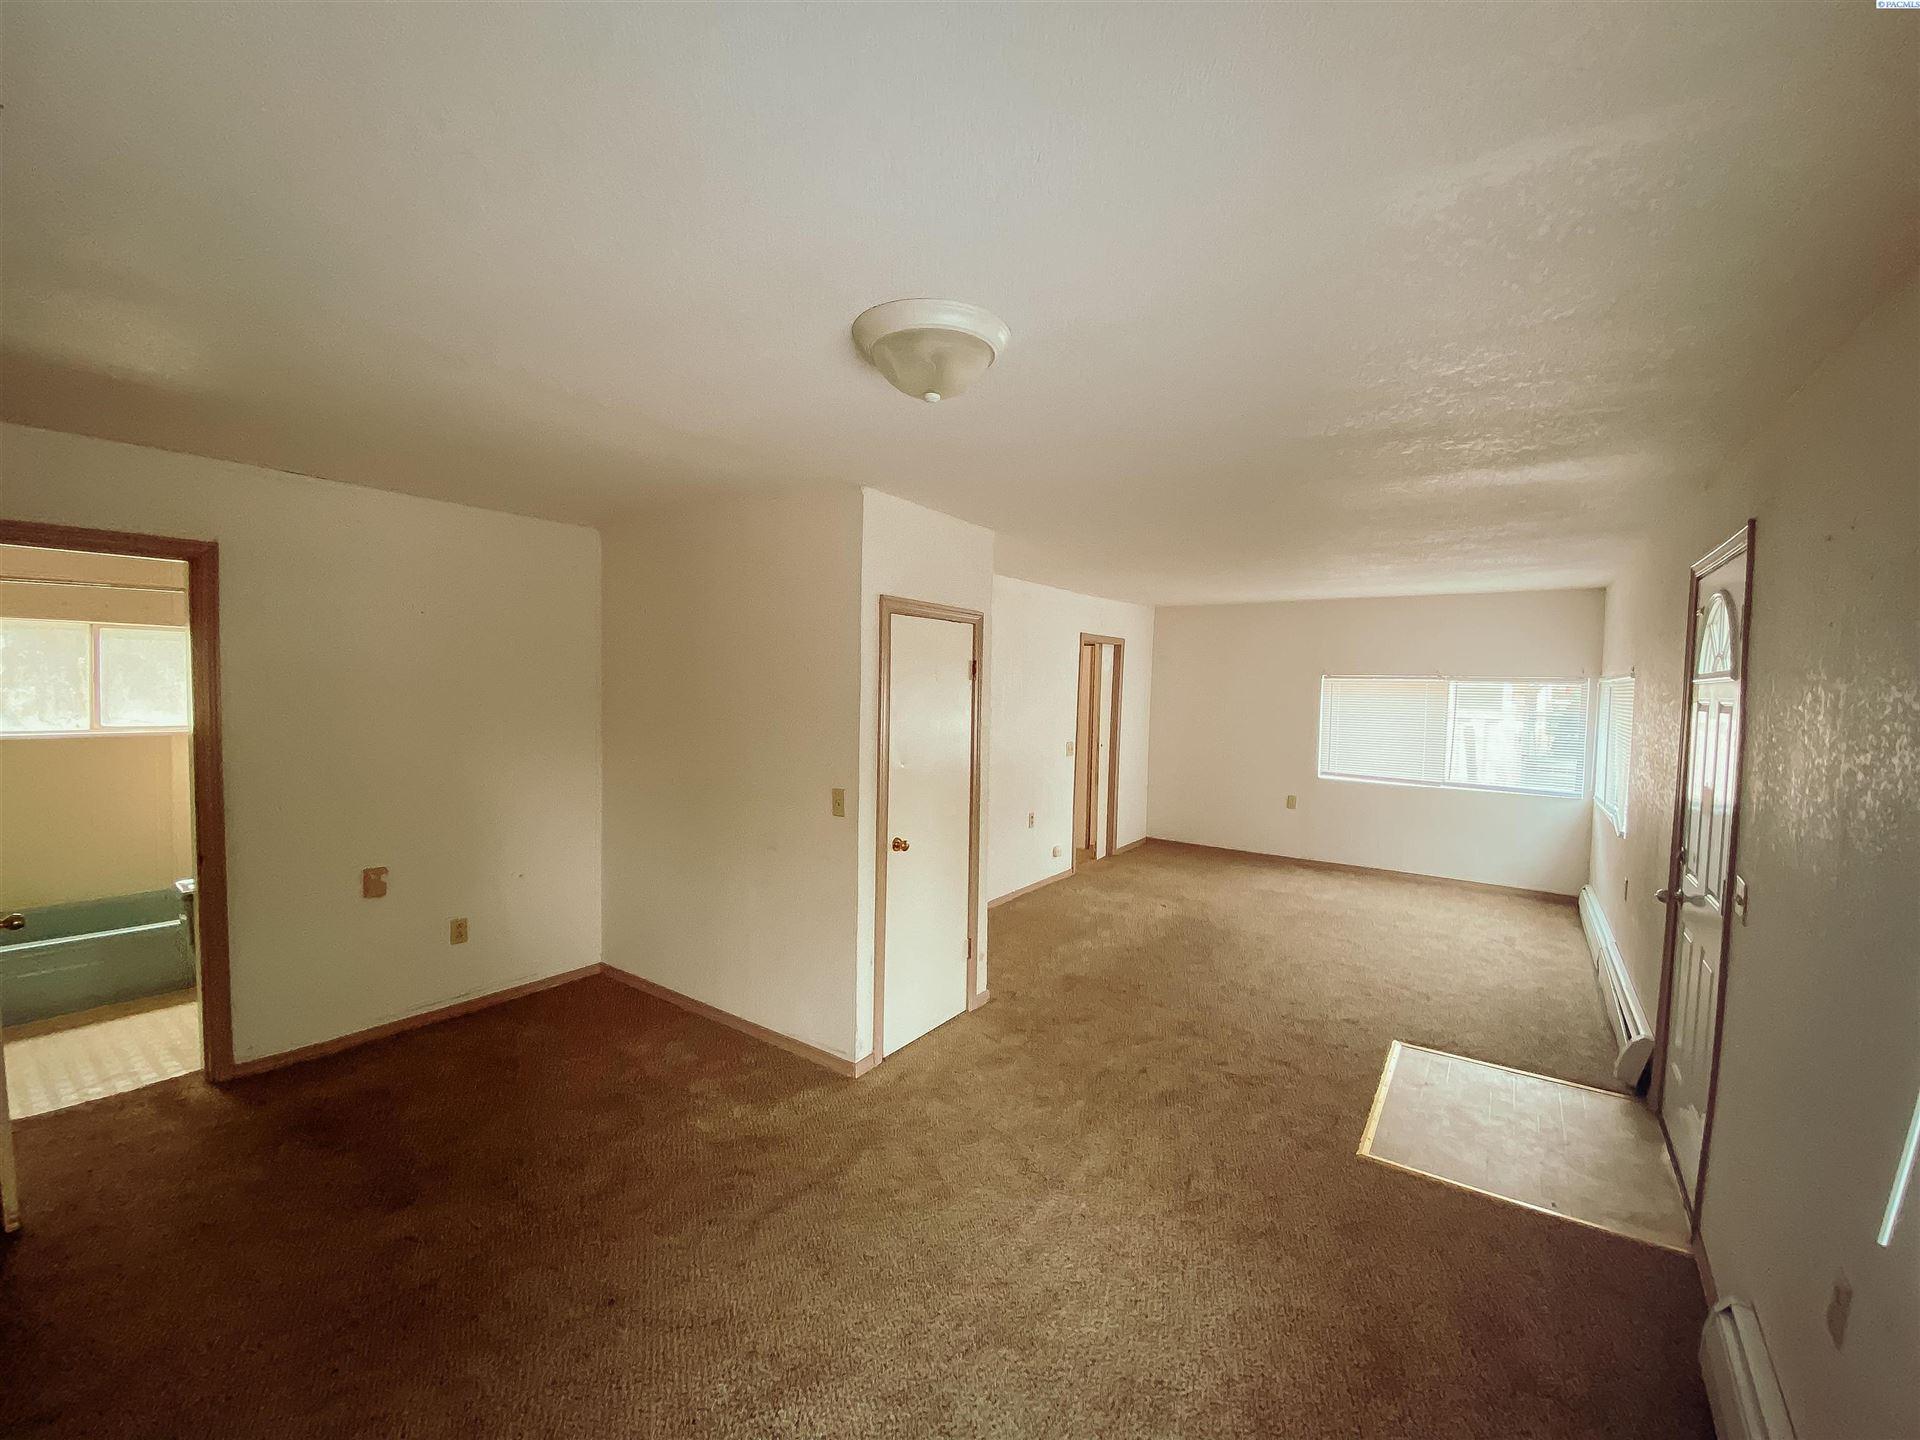 Photo of 1035 NW Ritchie St., Pullman, WA 99163 (MLS # 252523)